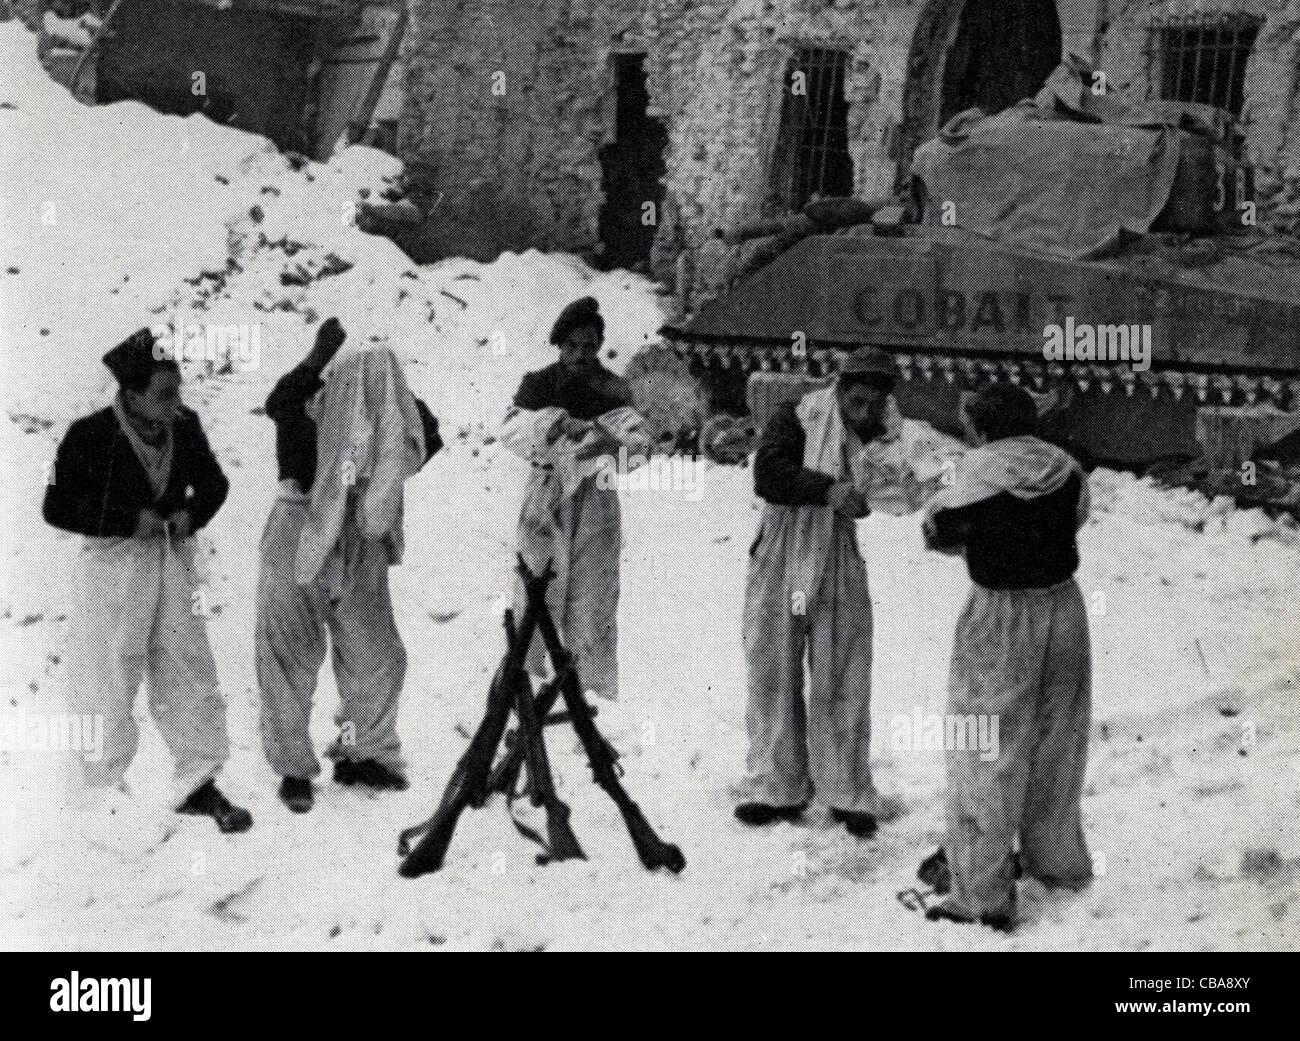 British infantry don snow camouflage uniforms alongside a Sherman tank. Italy WW11. - Stock Image